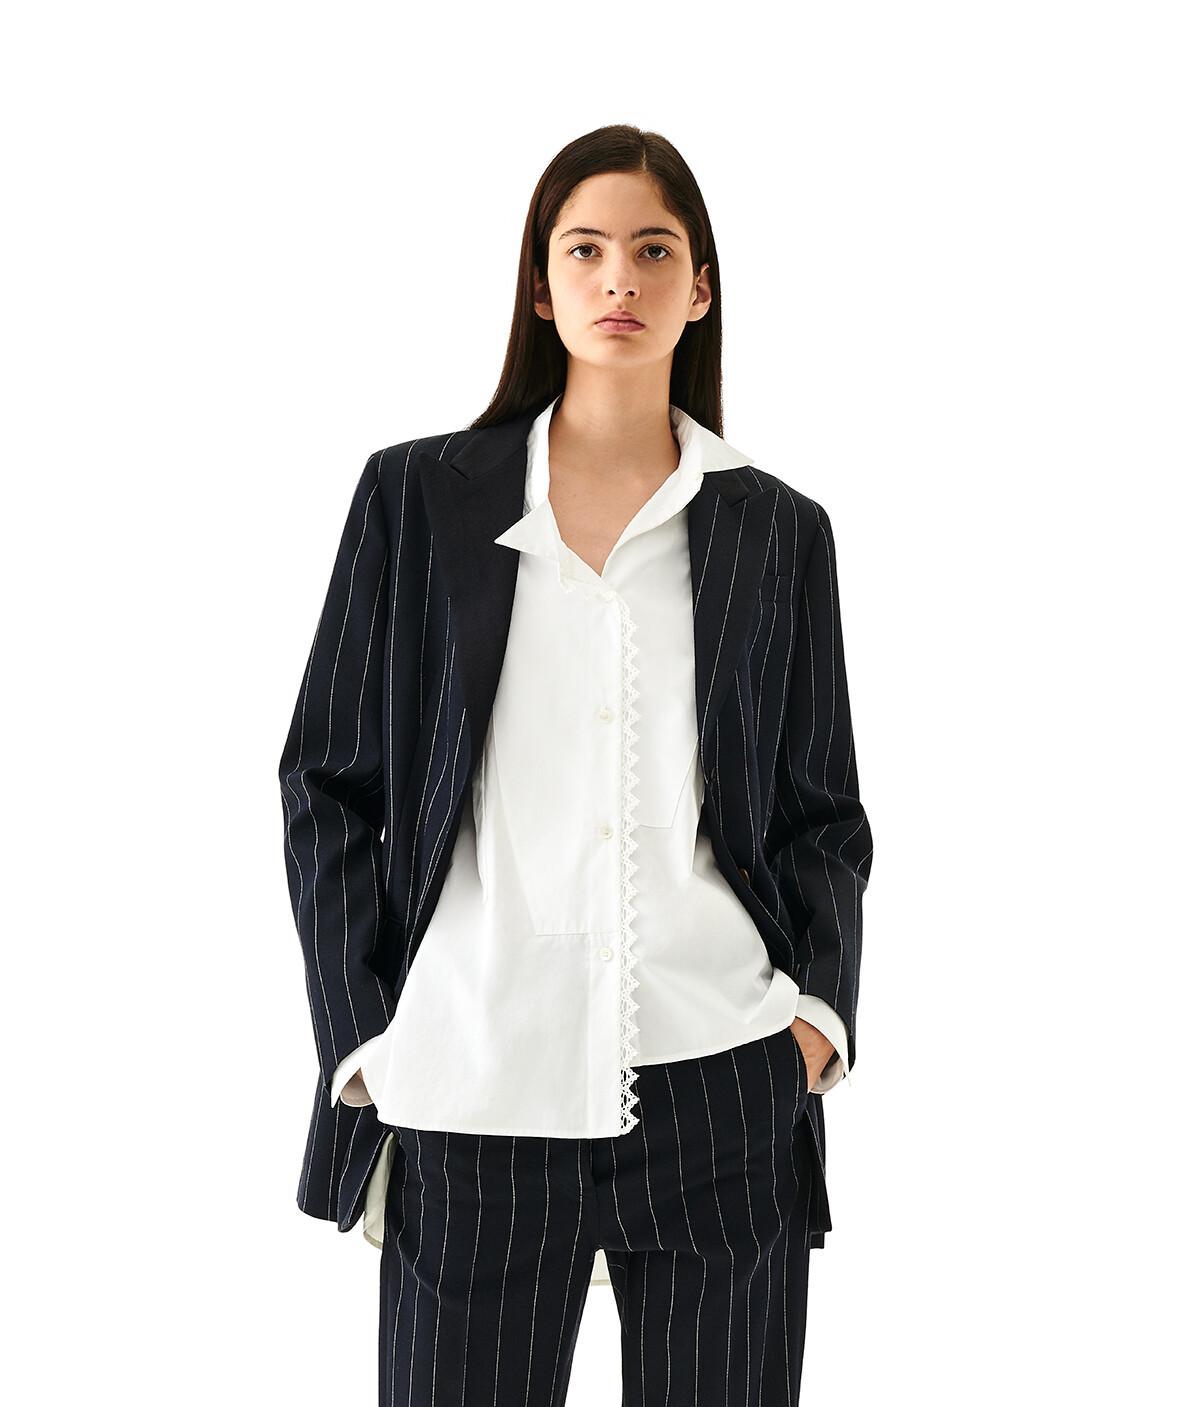 LOEWE Stripe Tuxedo Jacket 亞麻色/海軍藍 front